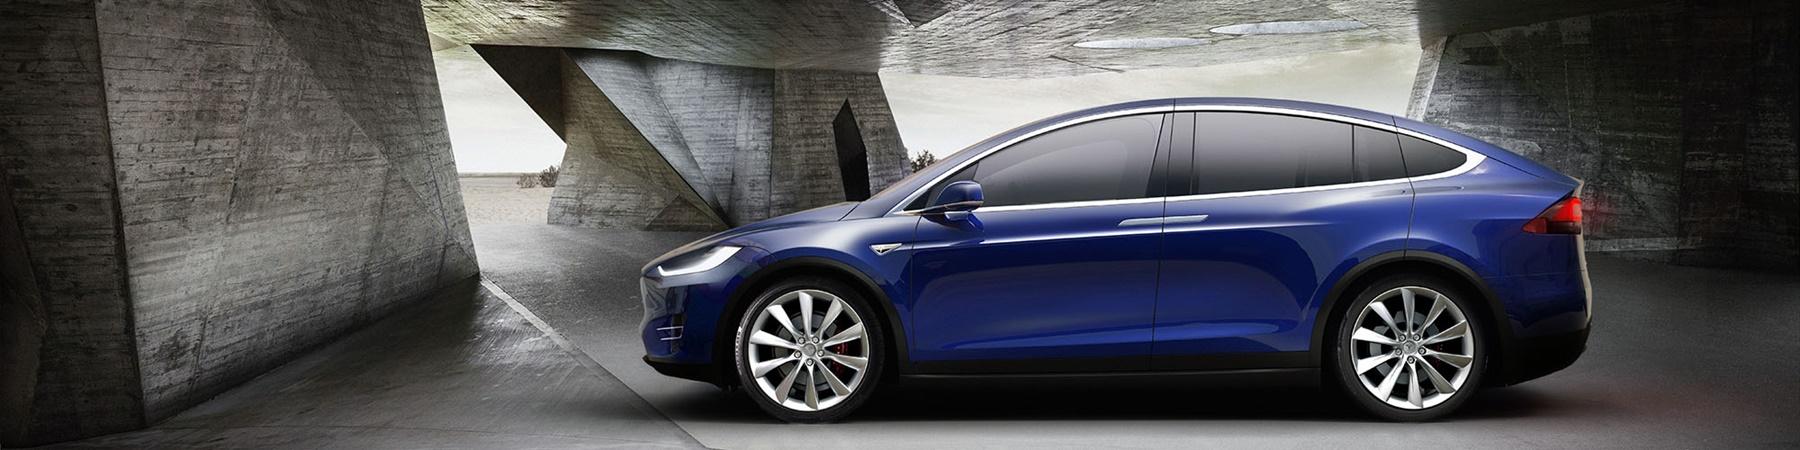 Tesla Model X 100kWh 461 km actieradius